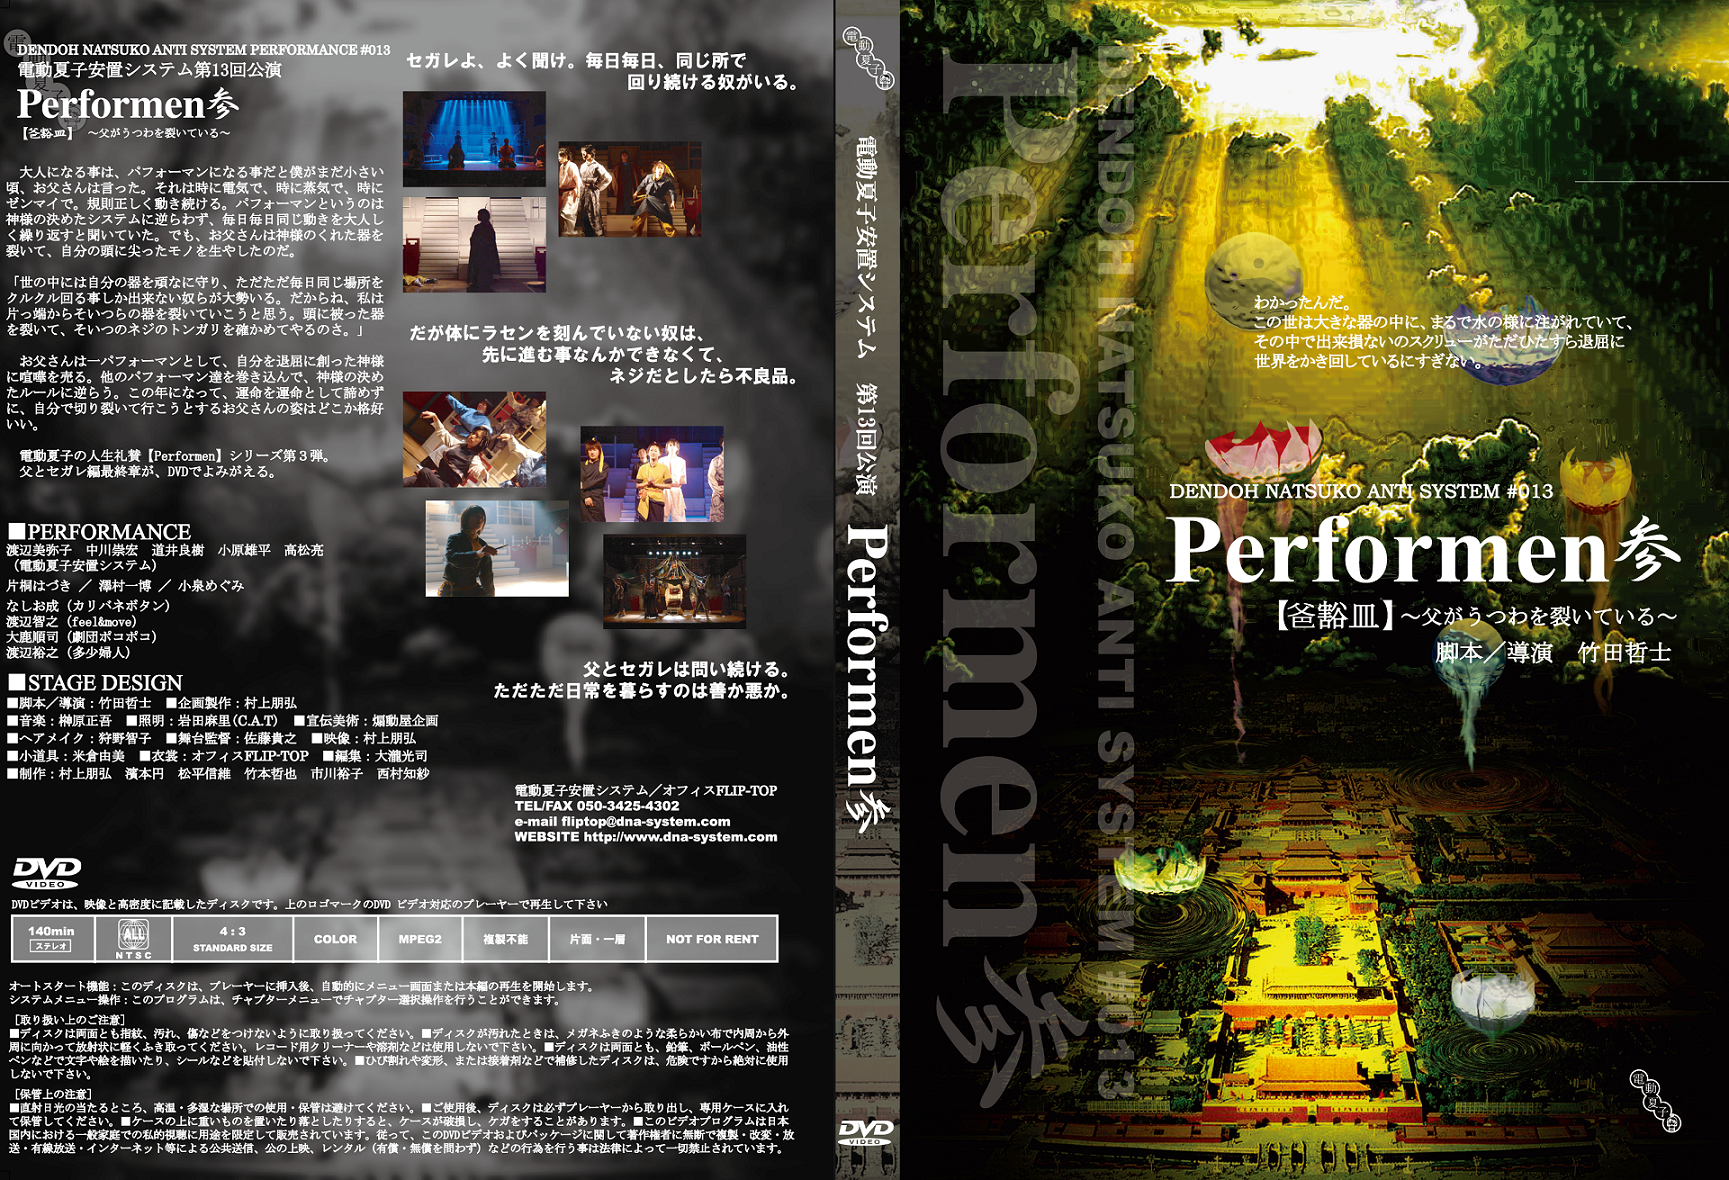 DVD 第13回公演『Performen参』